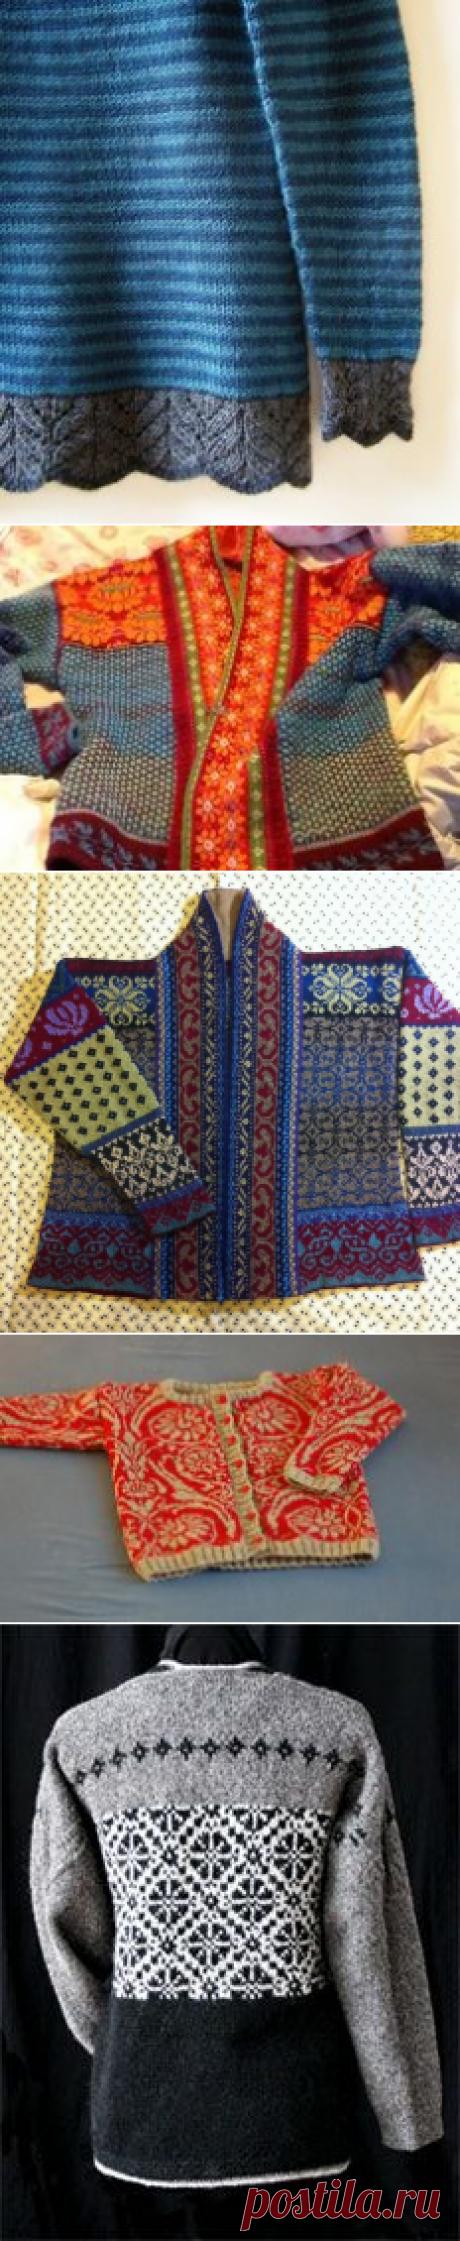 (1) Ravelry: Kauni Stranded Sampler Jacket pattern by Flory Loughead | Stranded knitting, Jacquard, Intarsia and the likes